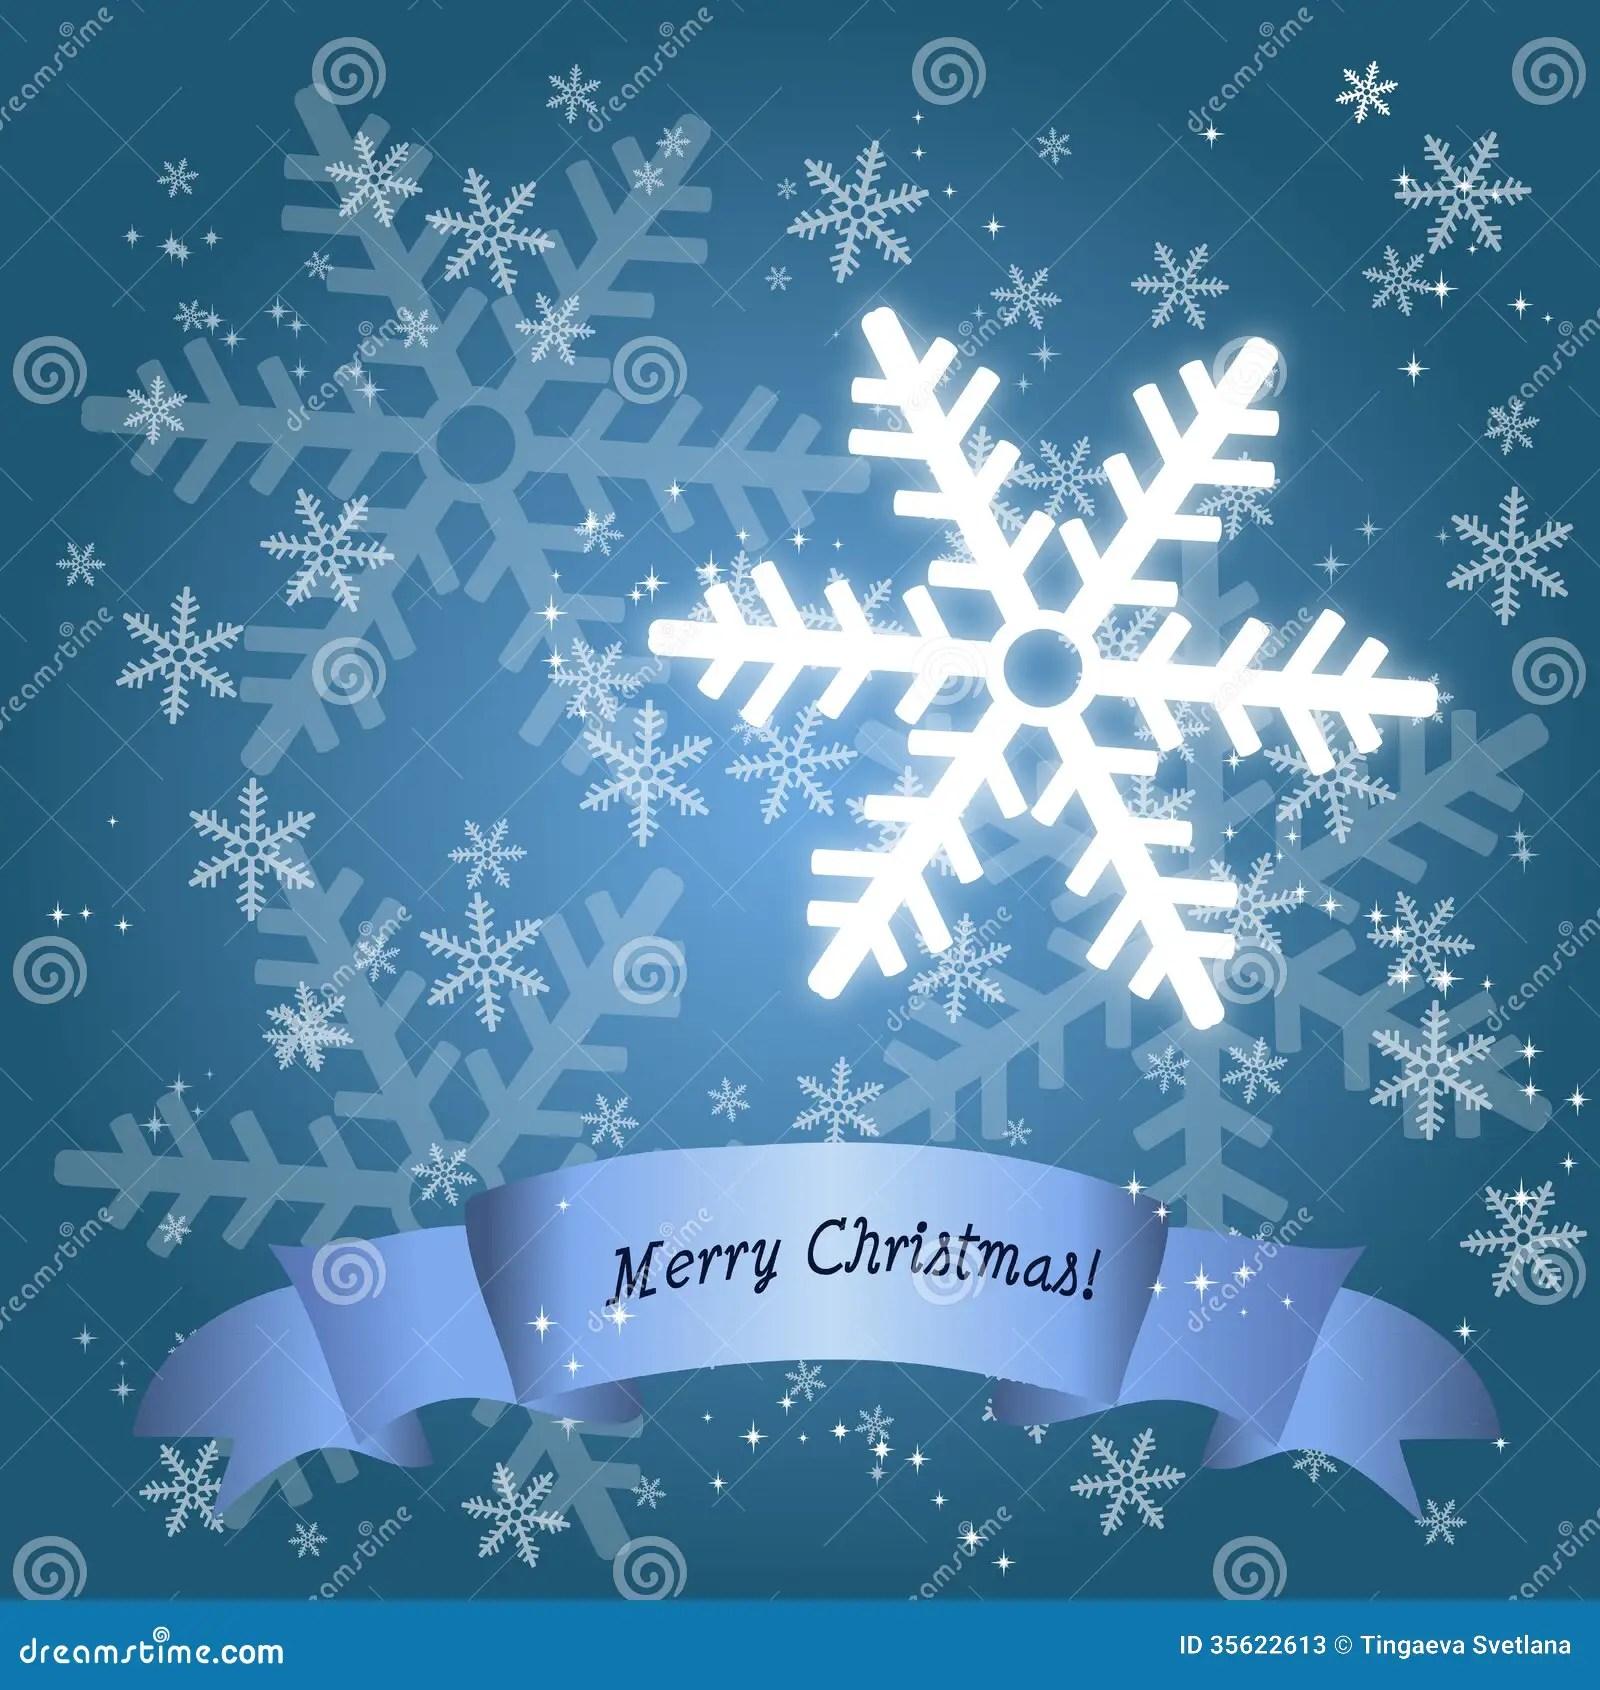 Holiday Season Snow Flake Card Stock Vector Image 35622613